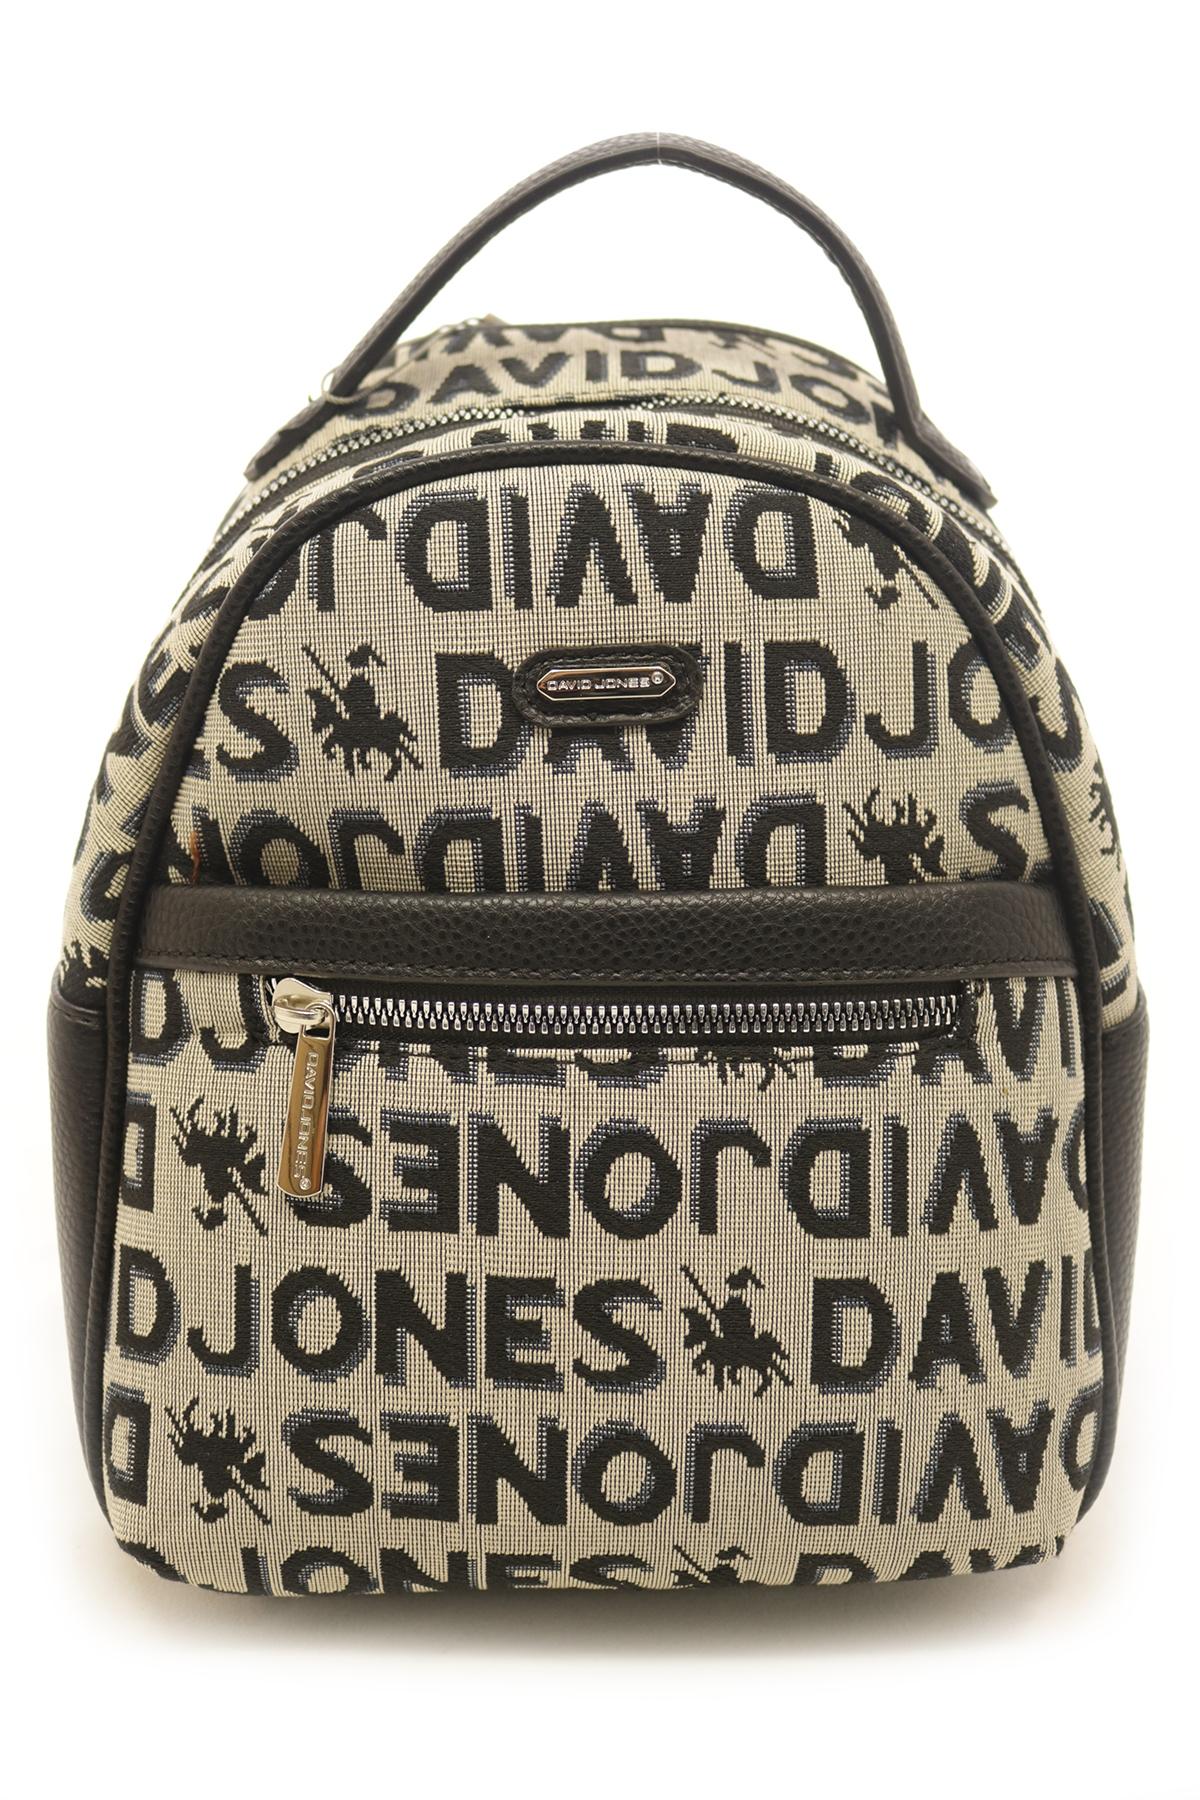 Рюкзак David Jones 6205 оптом